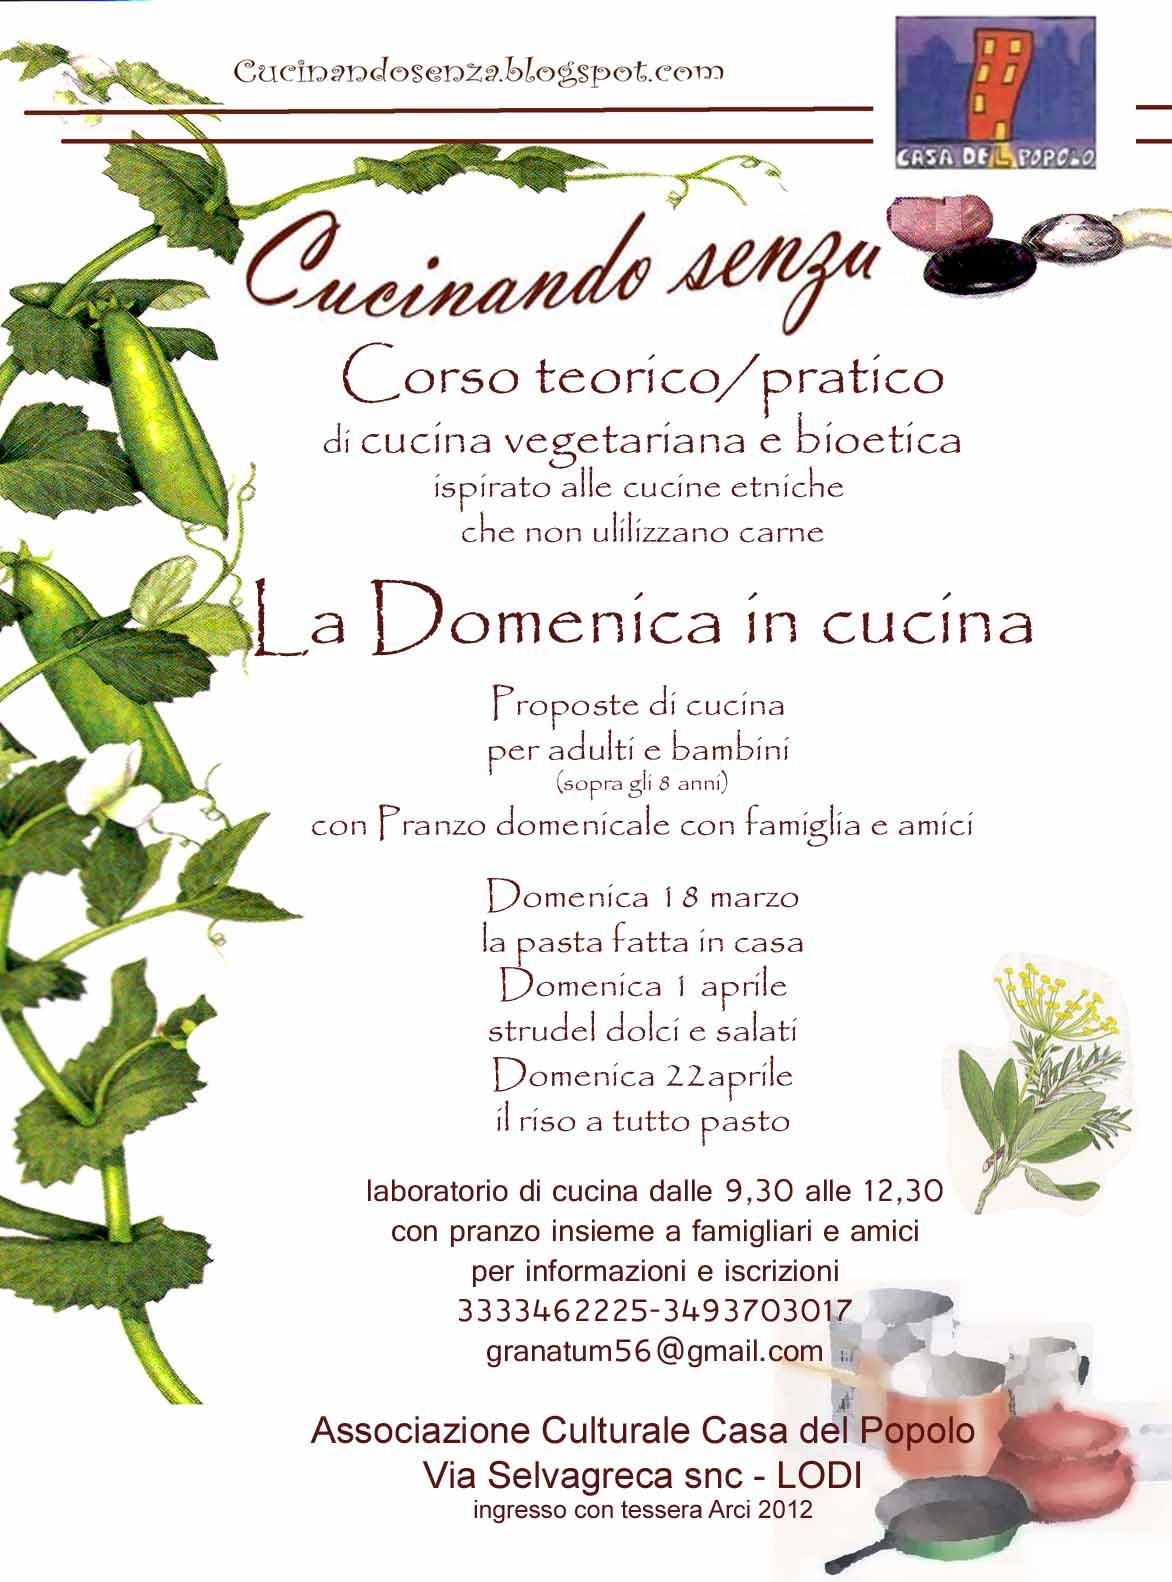 cucinando senza .....: nuovi corsi di cucina - Corso Cucina Vegetariana